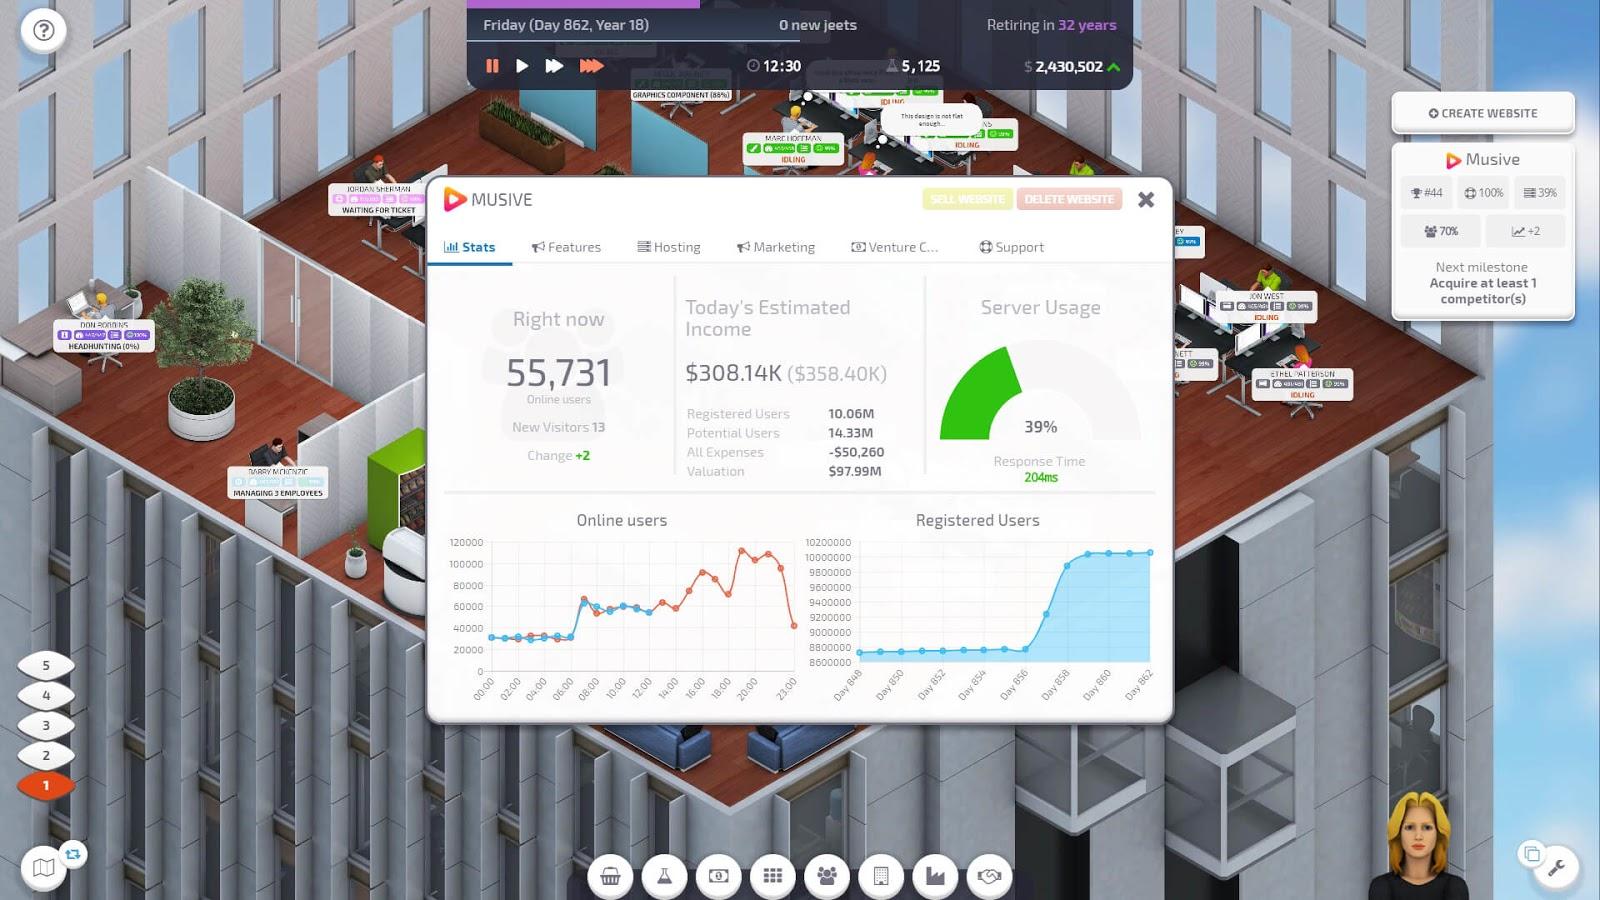 startup-company-pc-screenshot-02